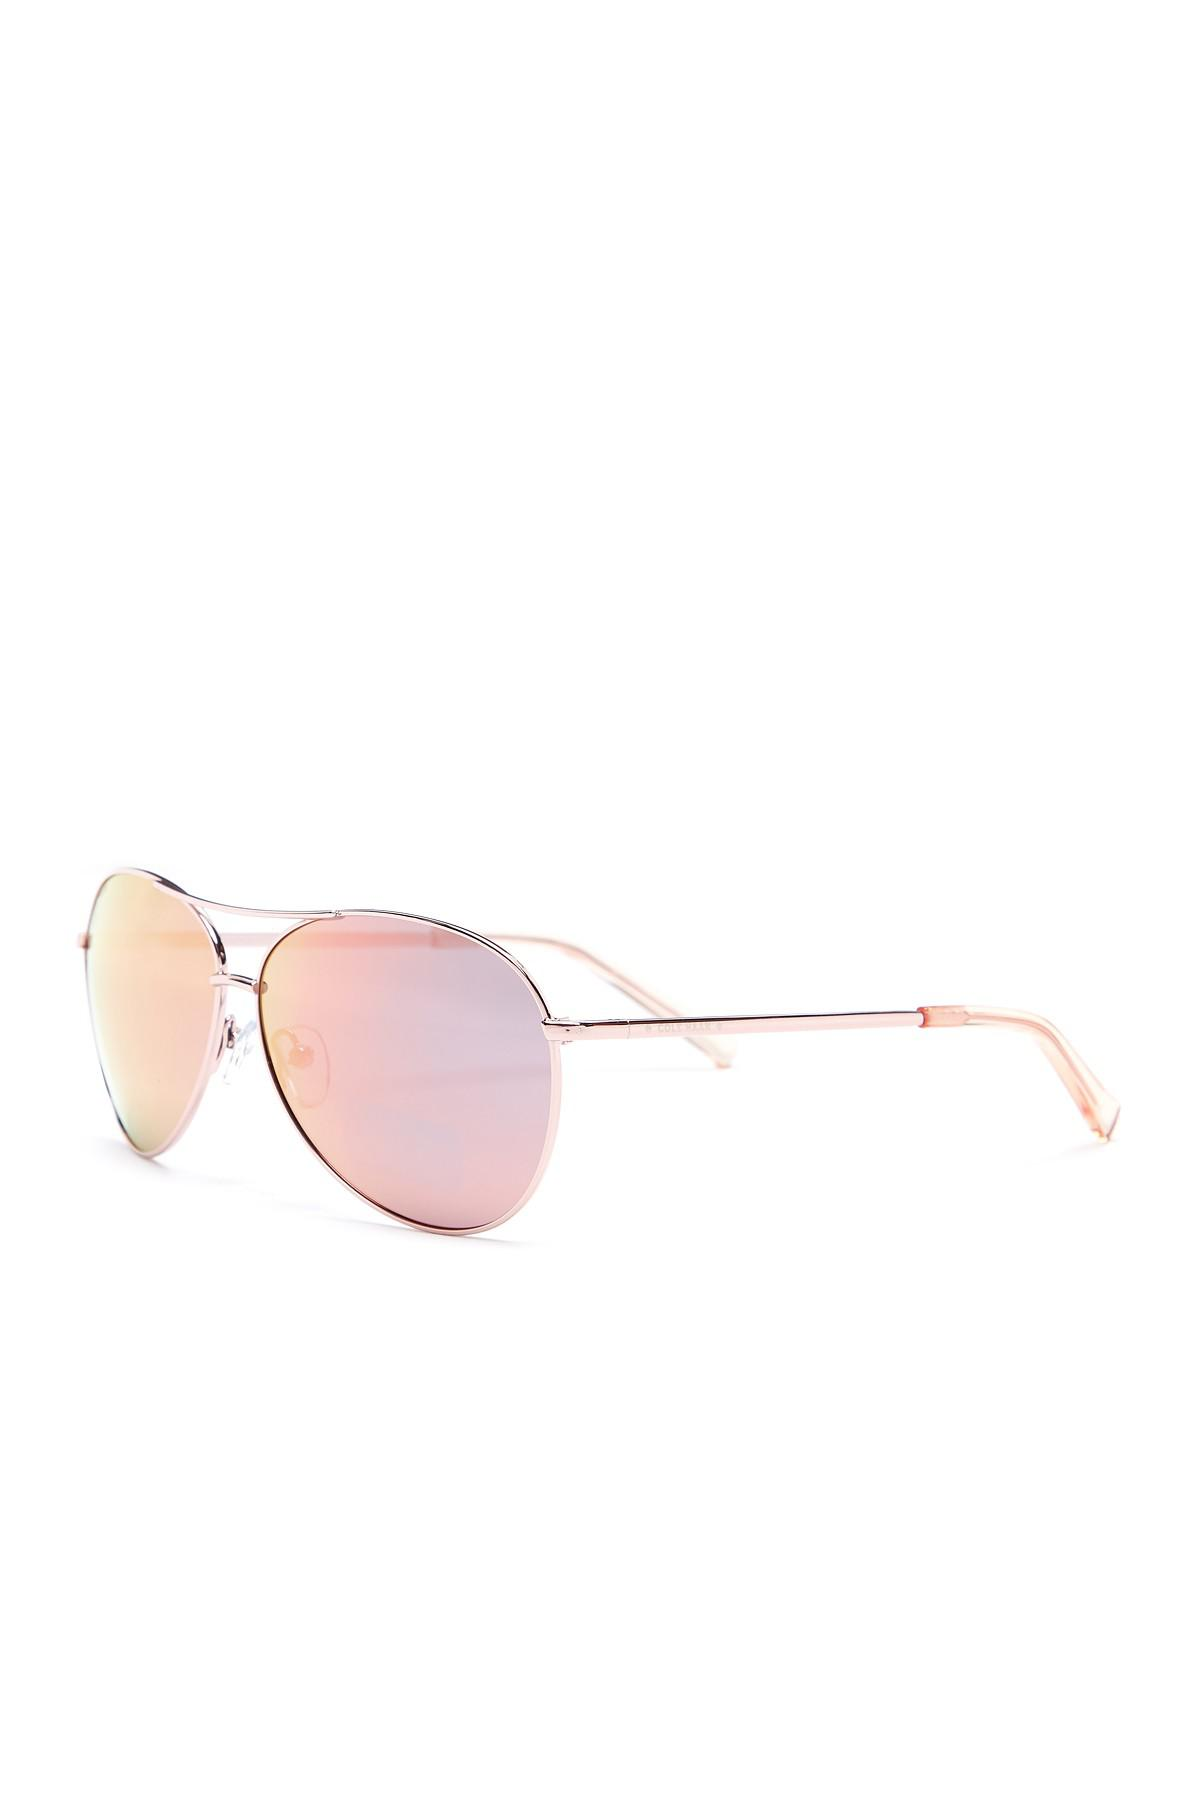 Lyst - Cole Haan Teardrop Aviator Metal Frame Sunglasses